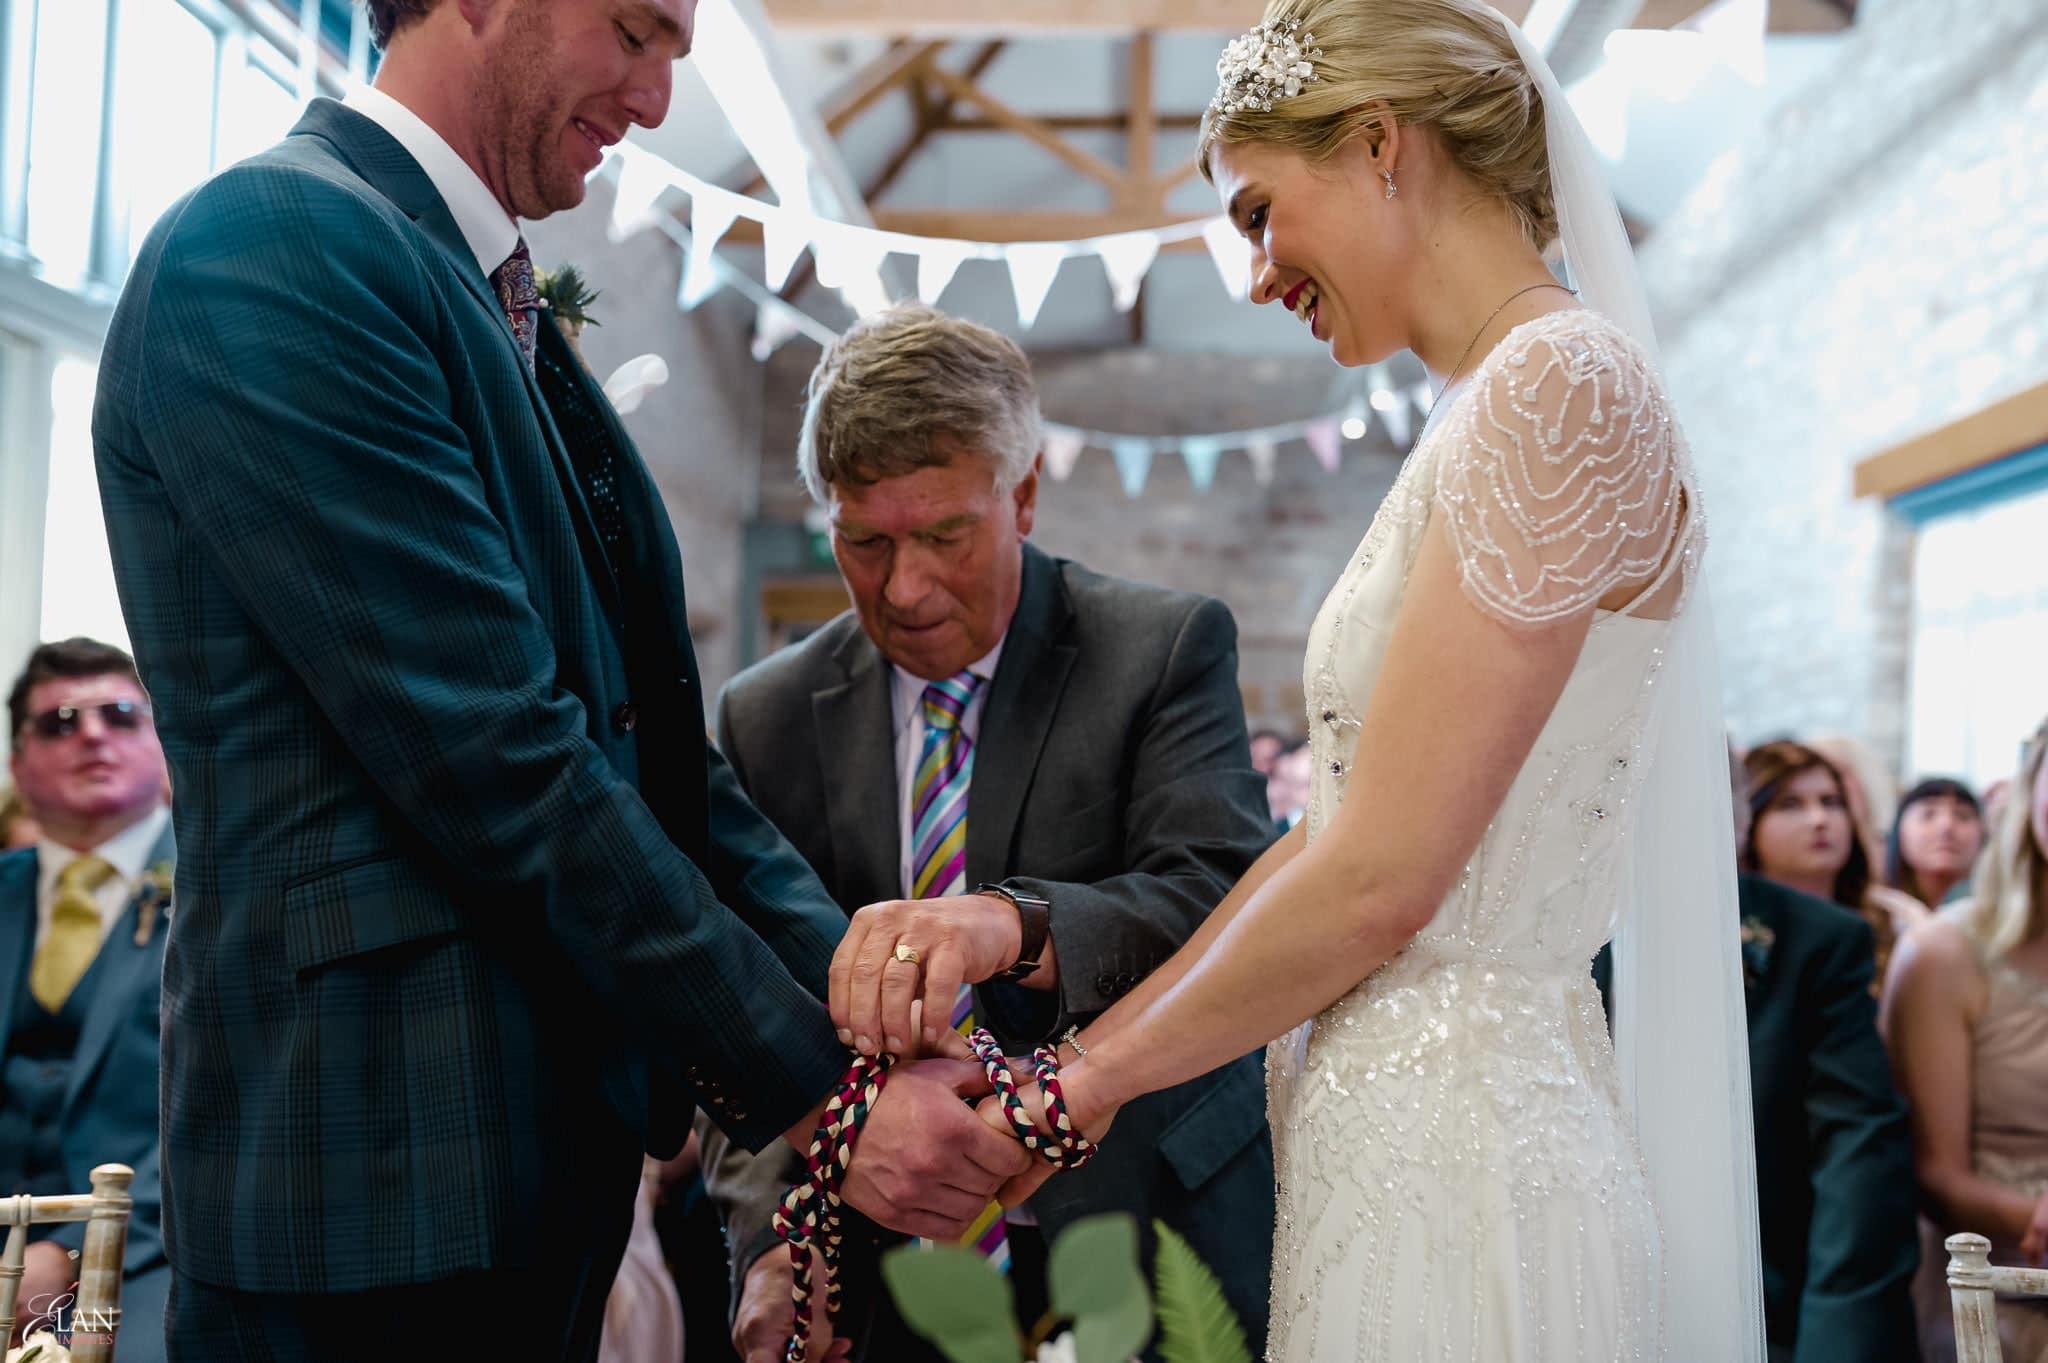 Spring Wedding at the Folly Farm Centre, Bristol 21